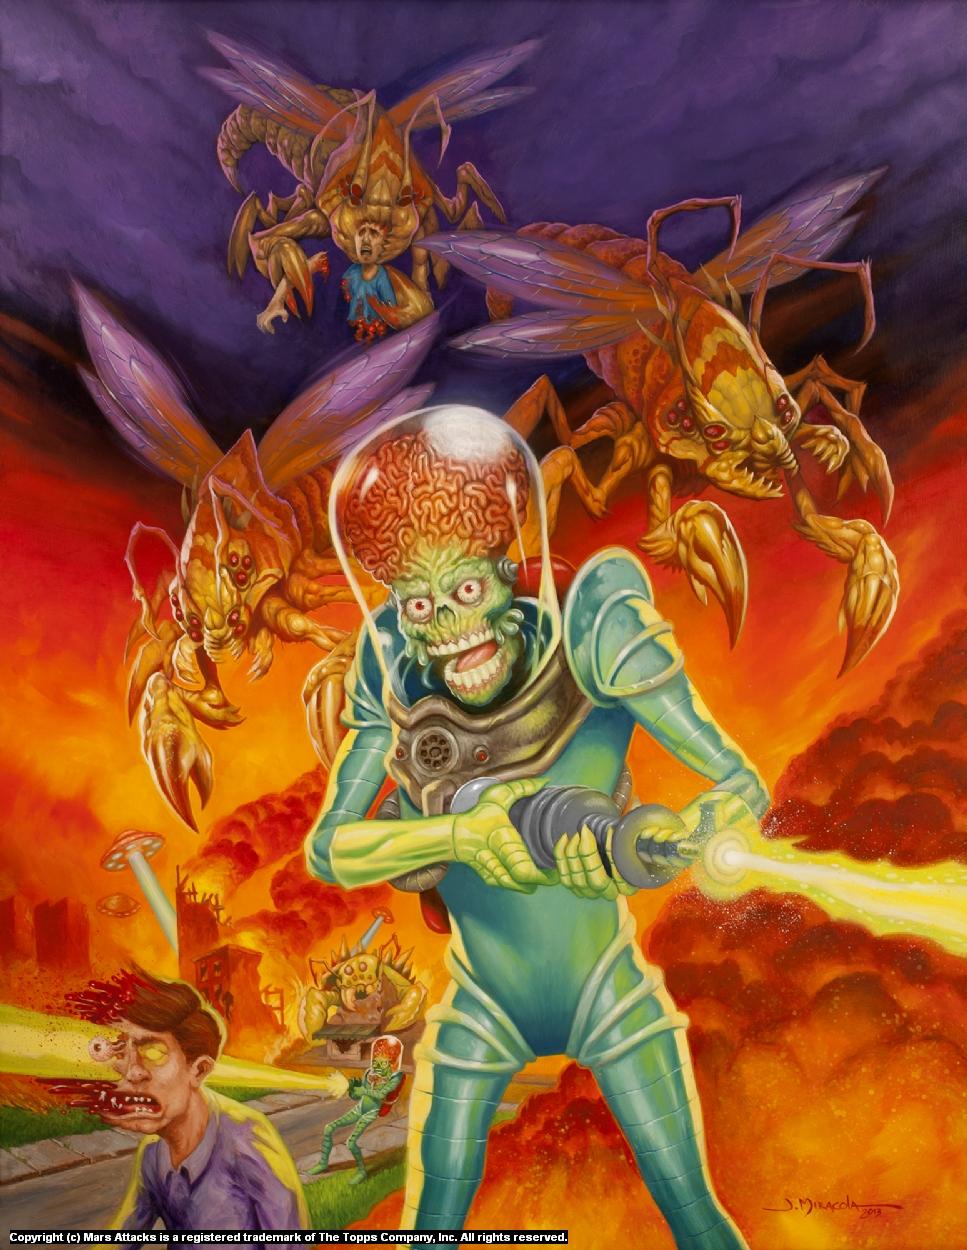 Mars Attacks! Artwork by Jeff Miracola